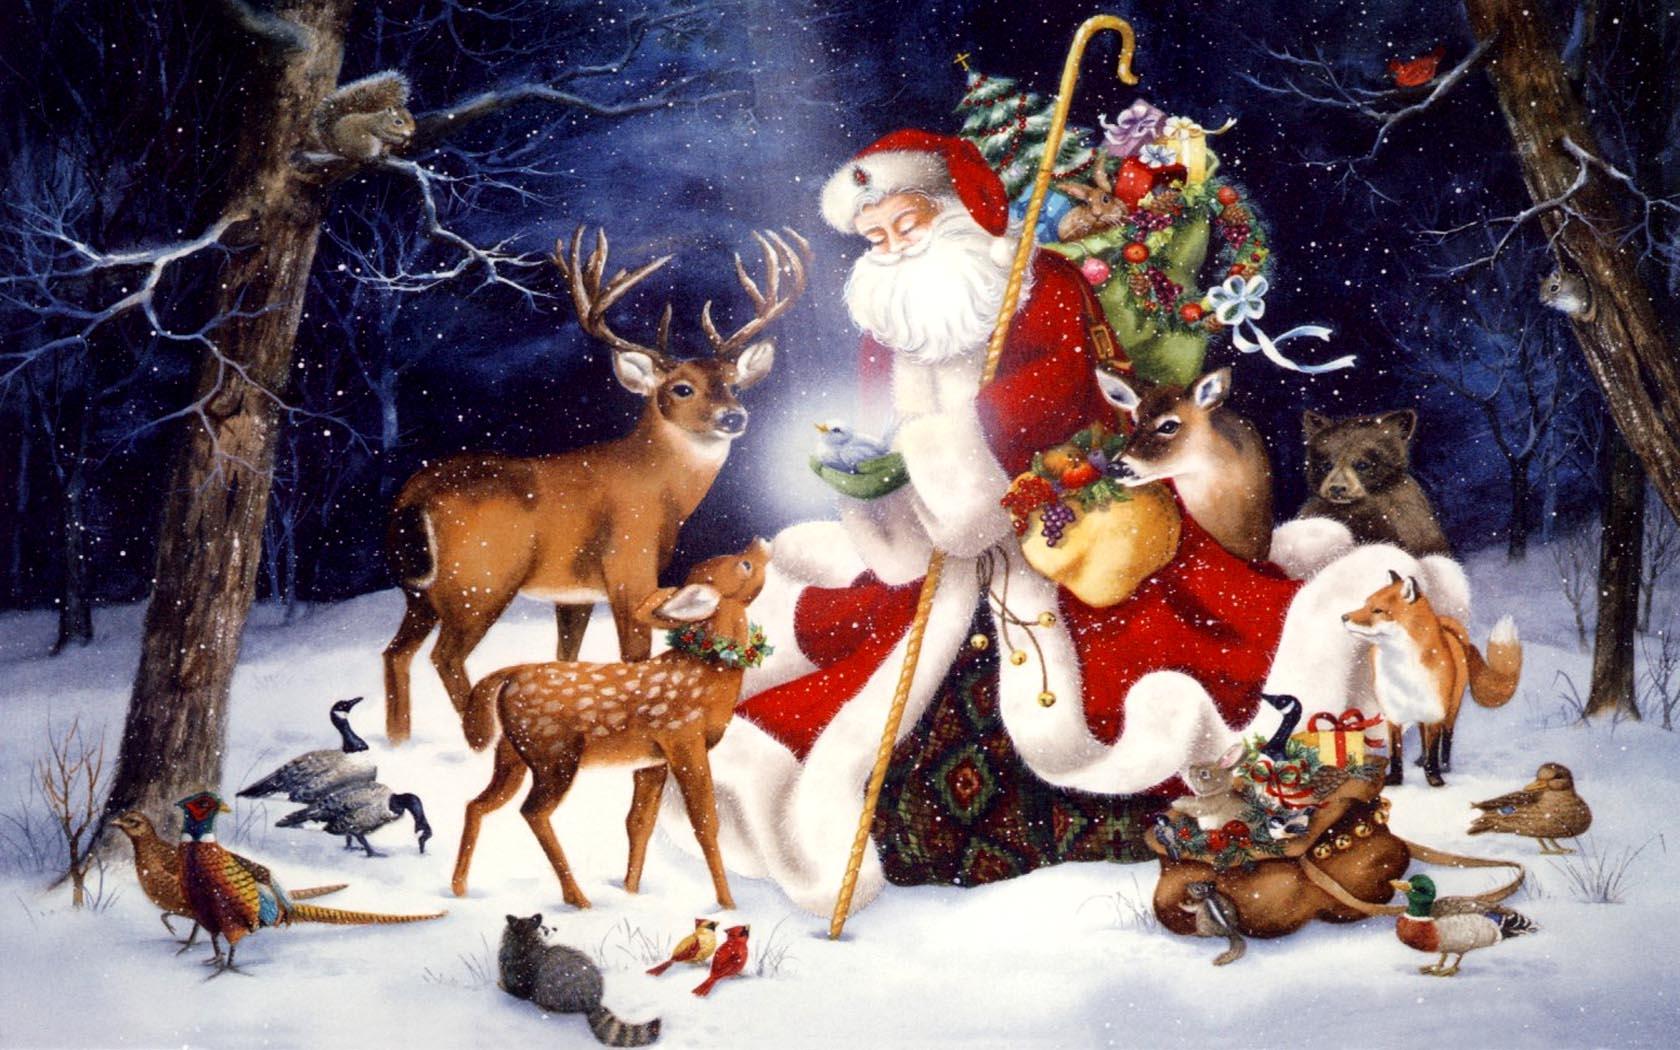 Christmas Screensavers Wallpaper Free Christmas Screensavers